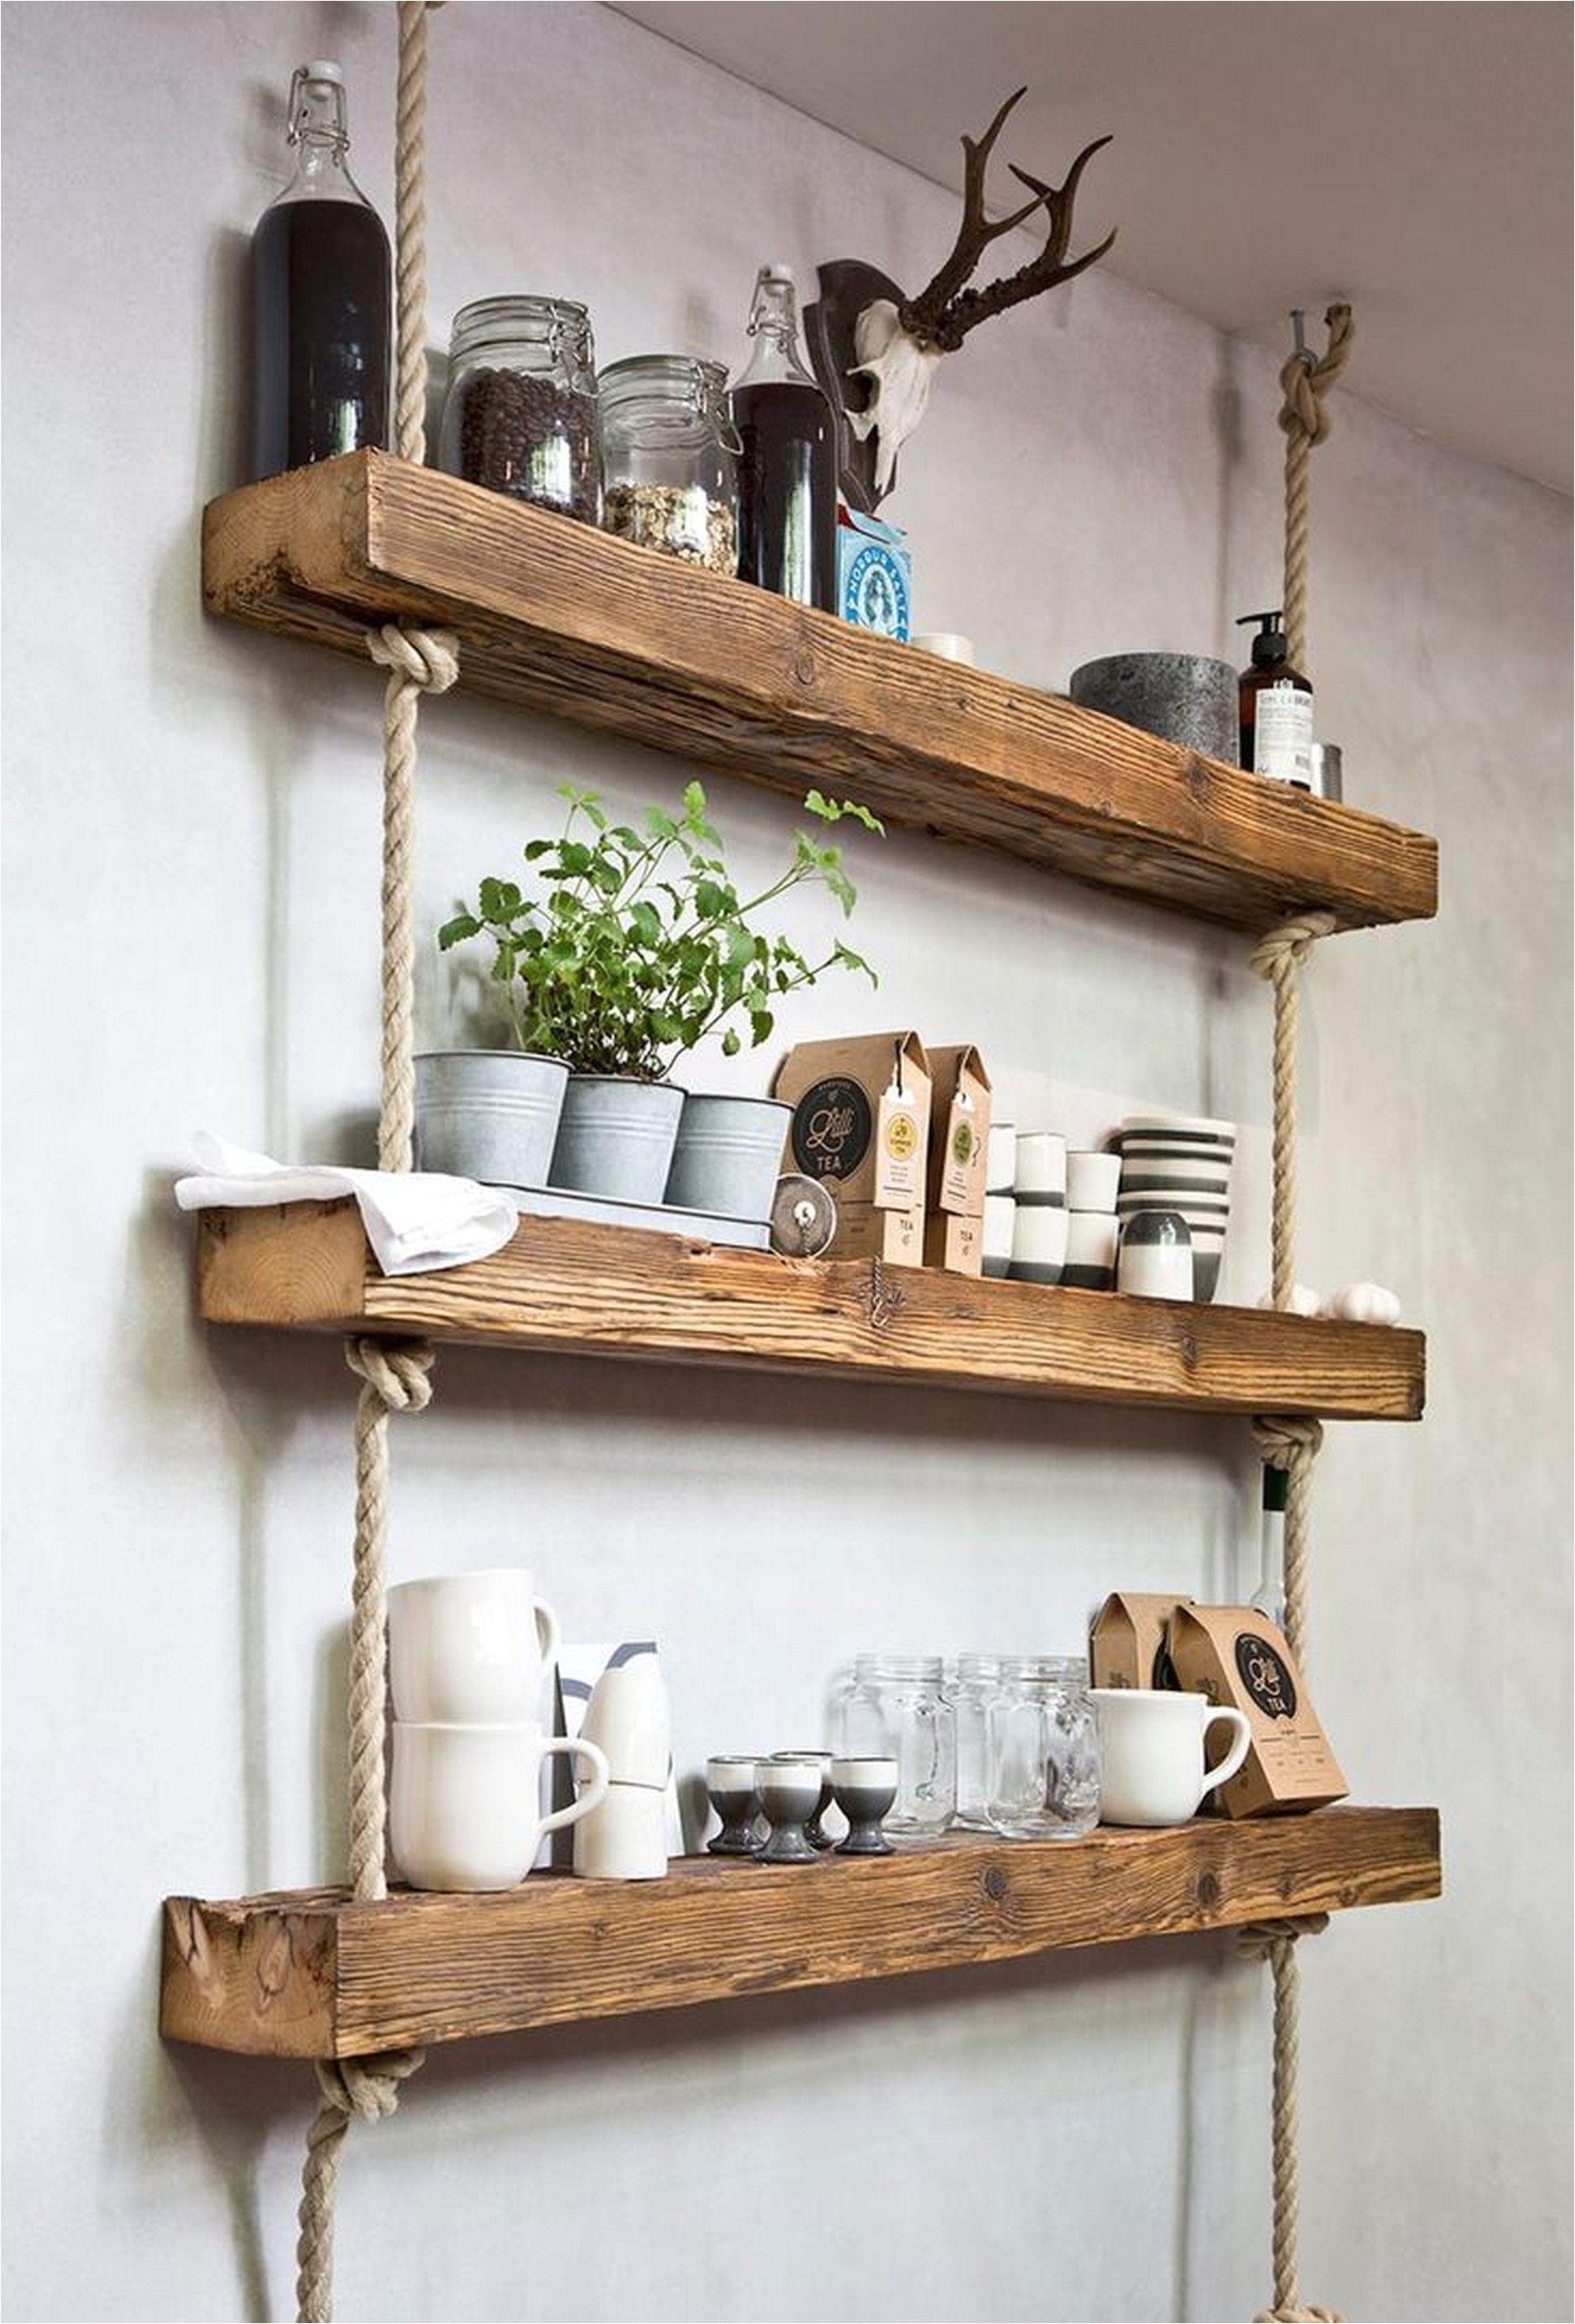 Diy Living Room Shelf Ideas Easy and Stylish Diy Wooden Wall Shelves Ideas